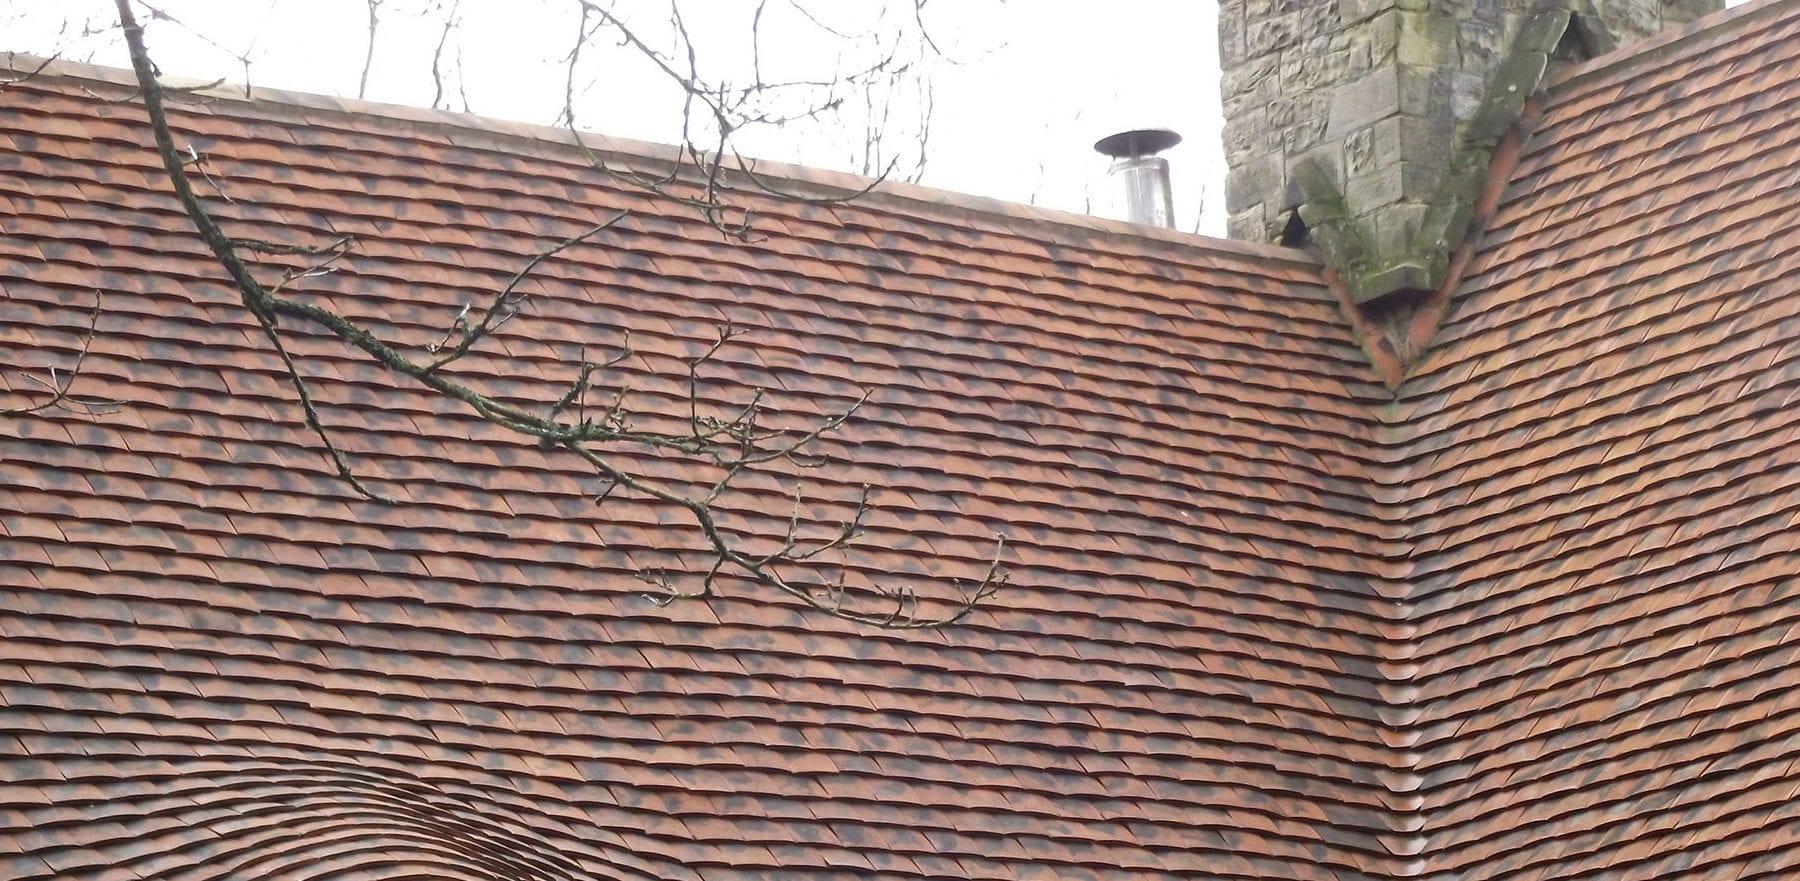 Lifestiles - Handmade Berkshire Clay Roof Tiles - Flimwell, England 3